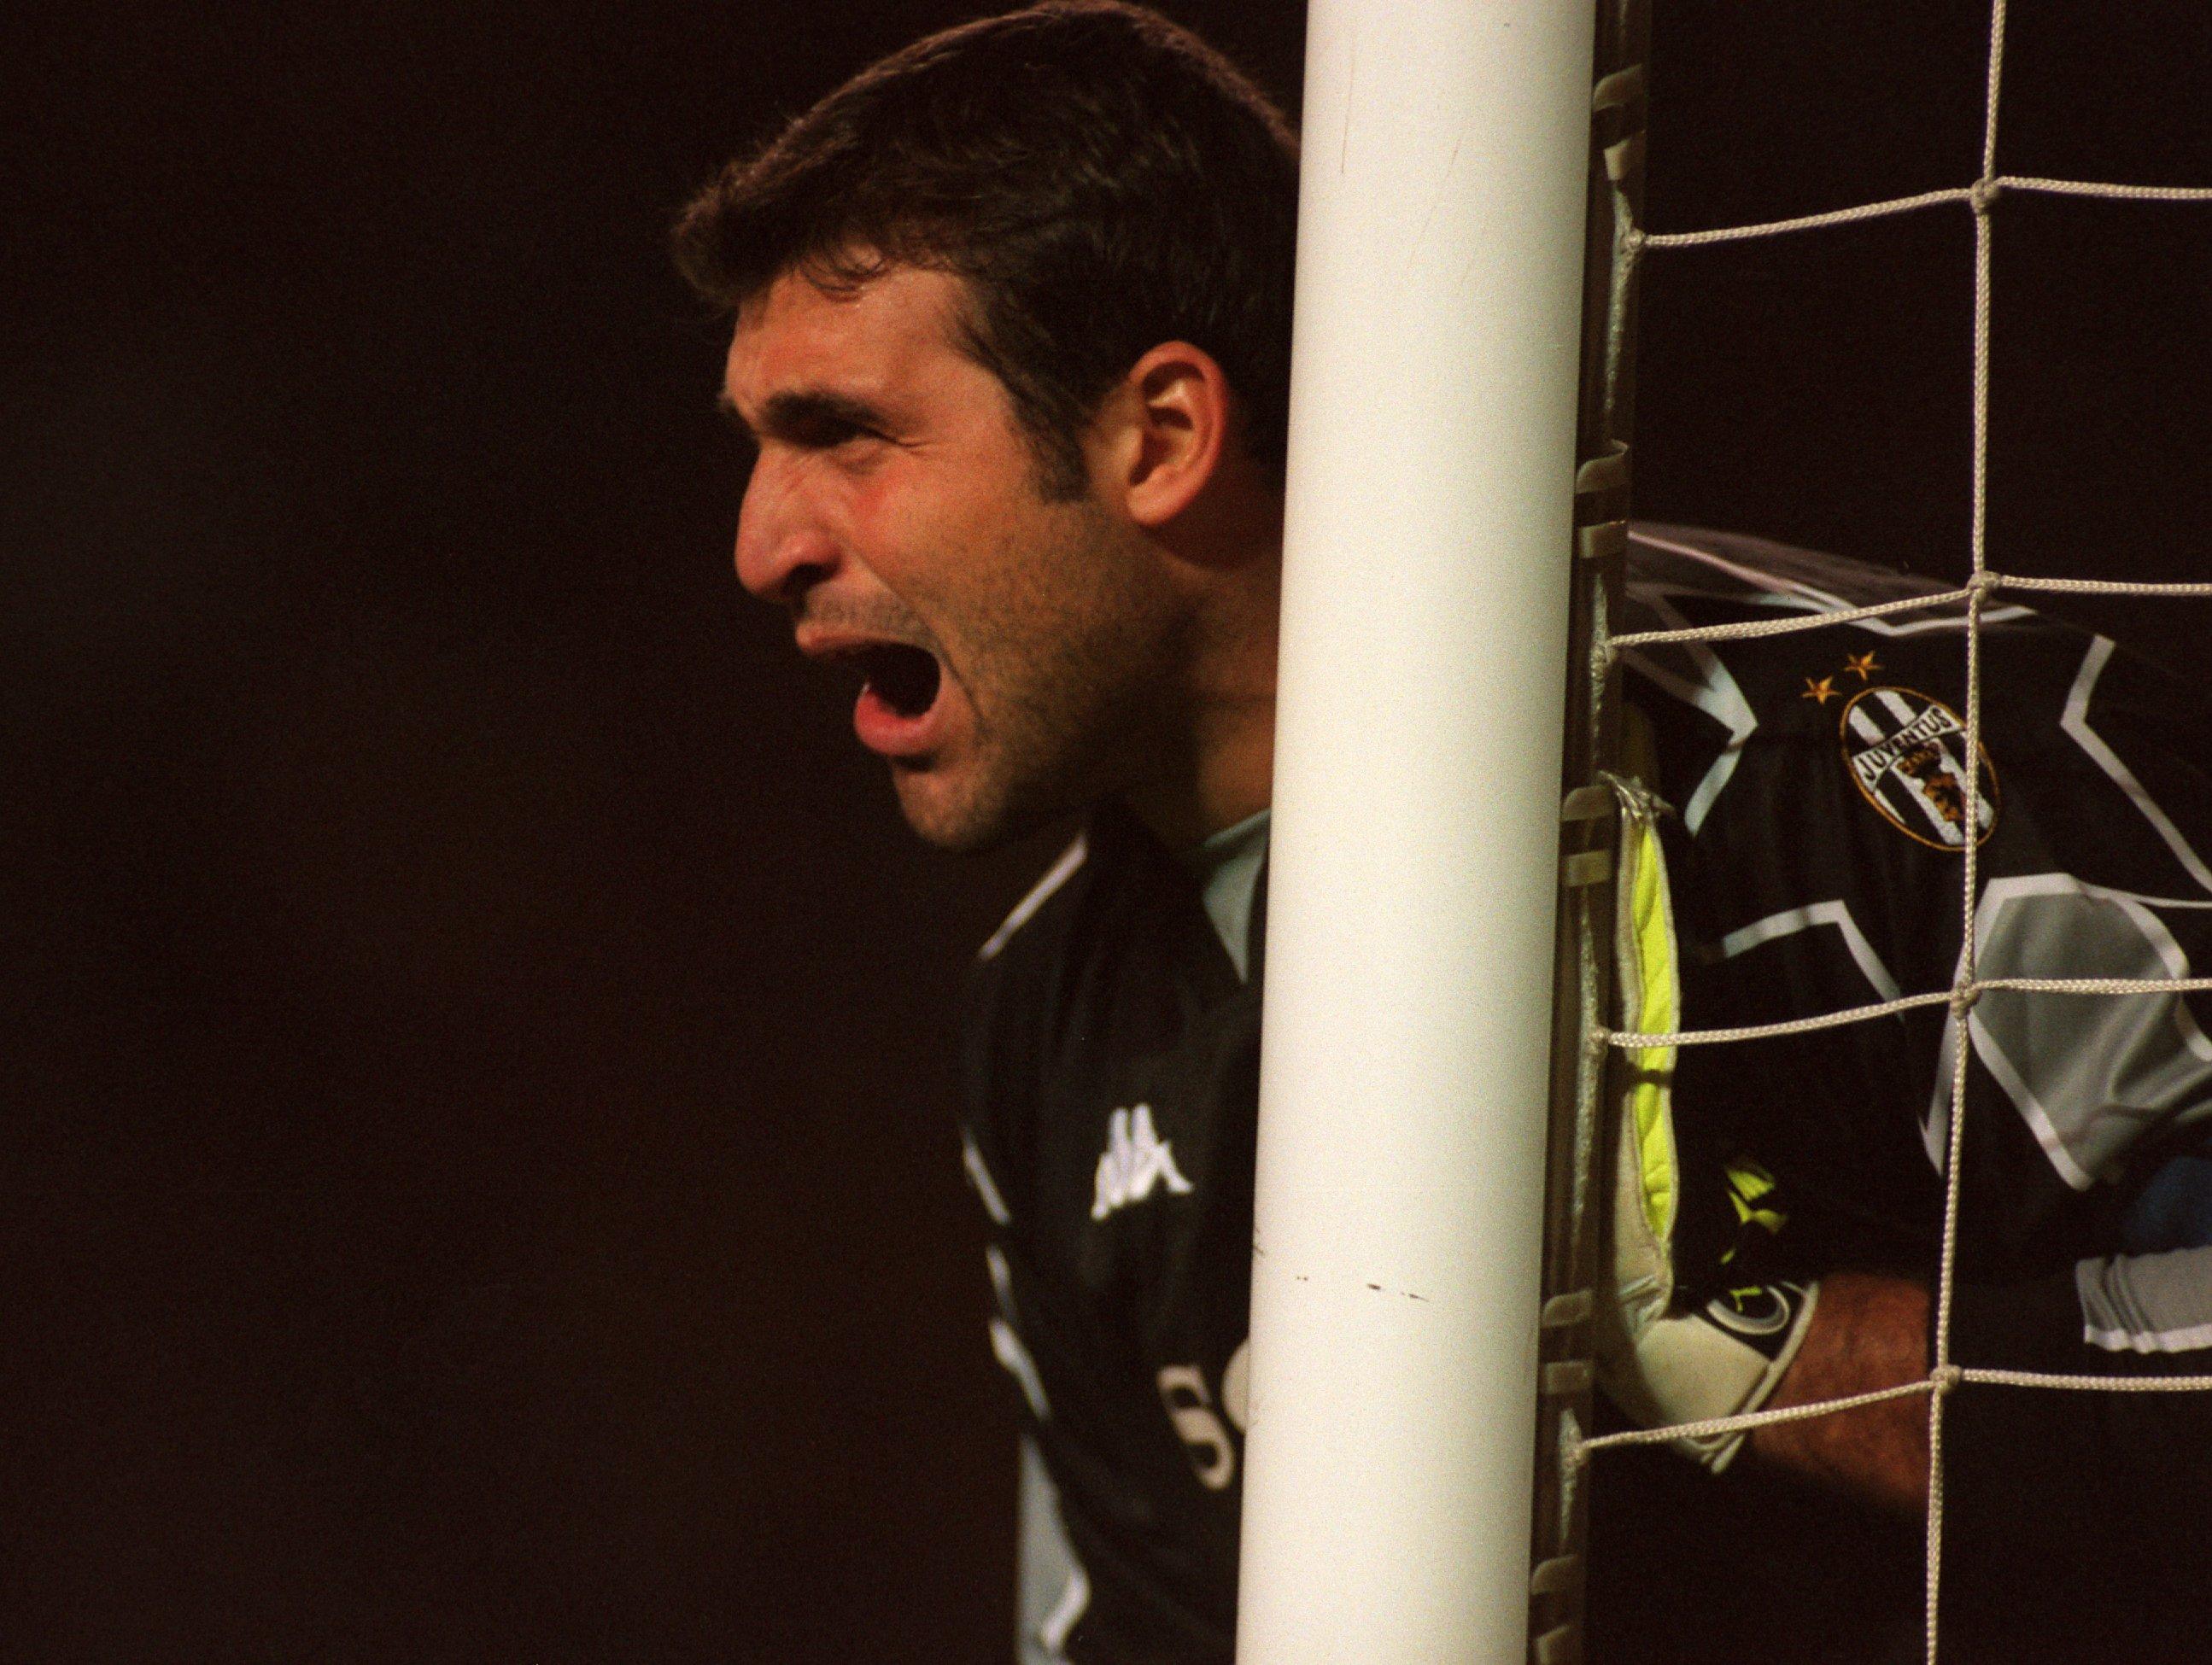 Soccer - UEFA Champions League - Manchester United v Juventus